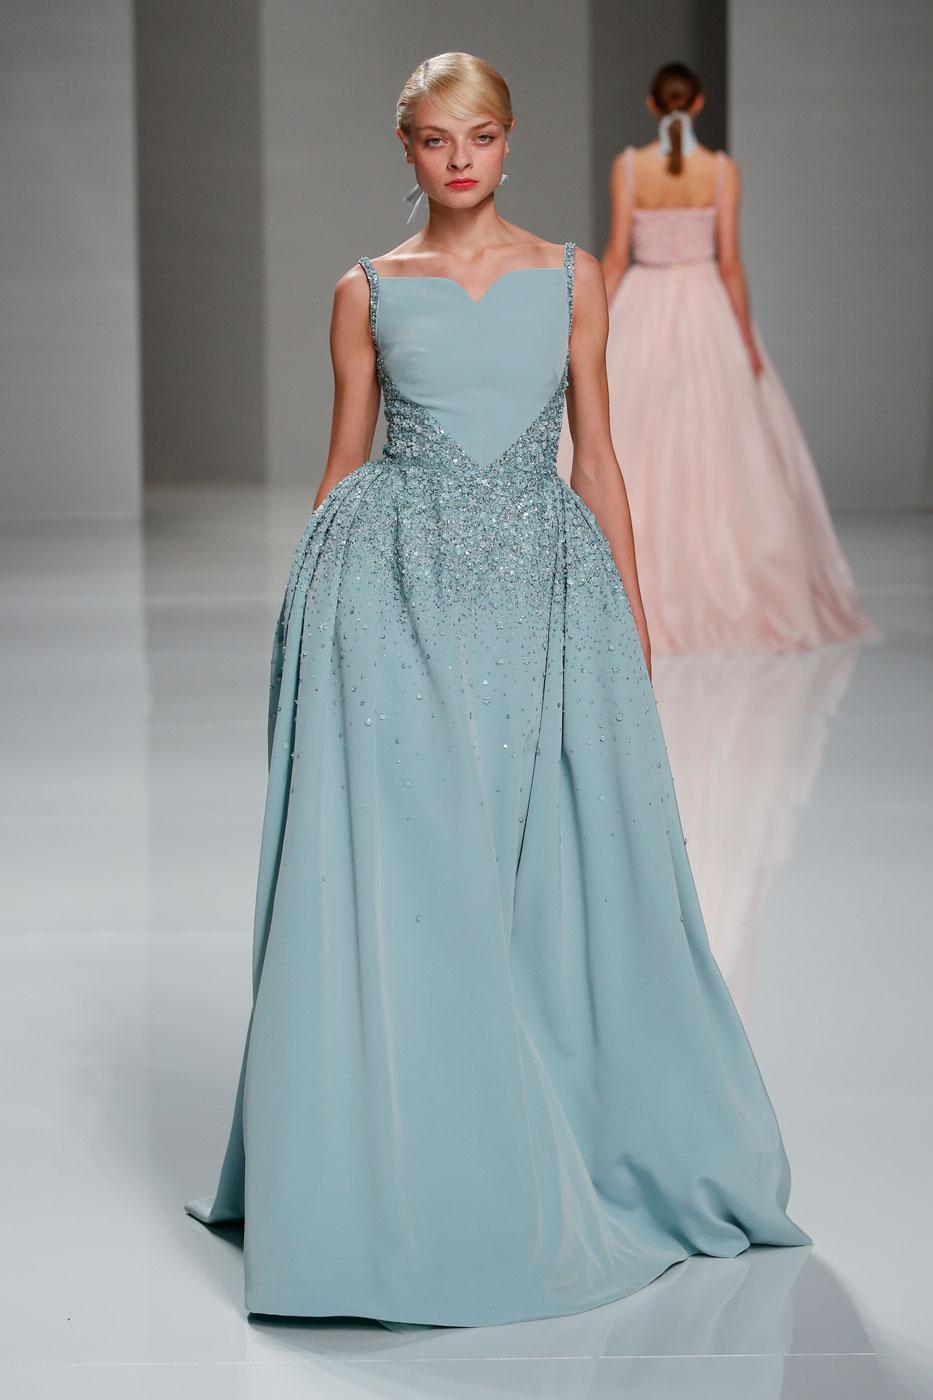 Georges-Hobeika-fashion-runway-show-haute-couture-paris-spring-2015-the-impression-45